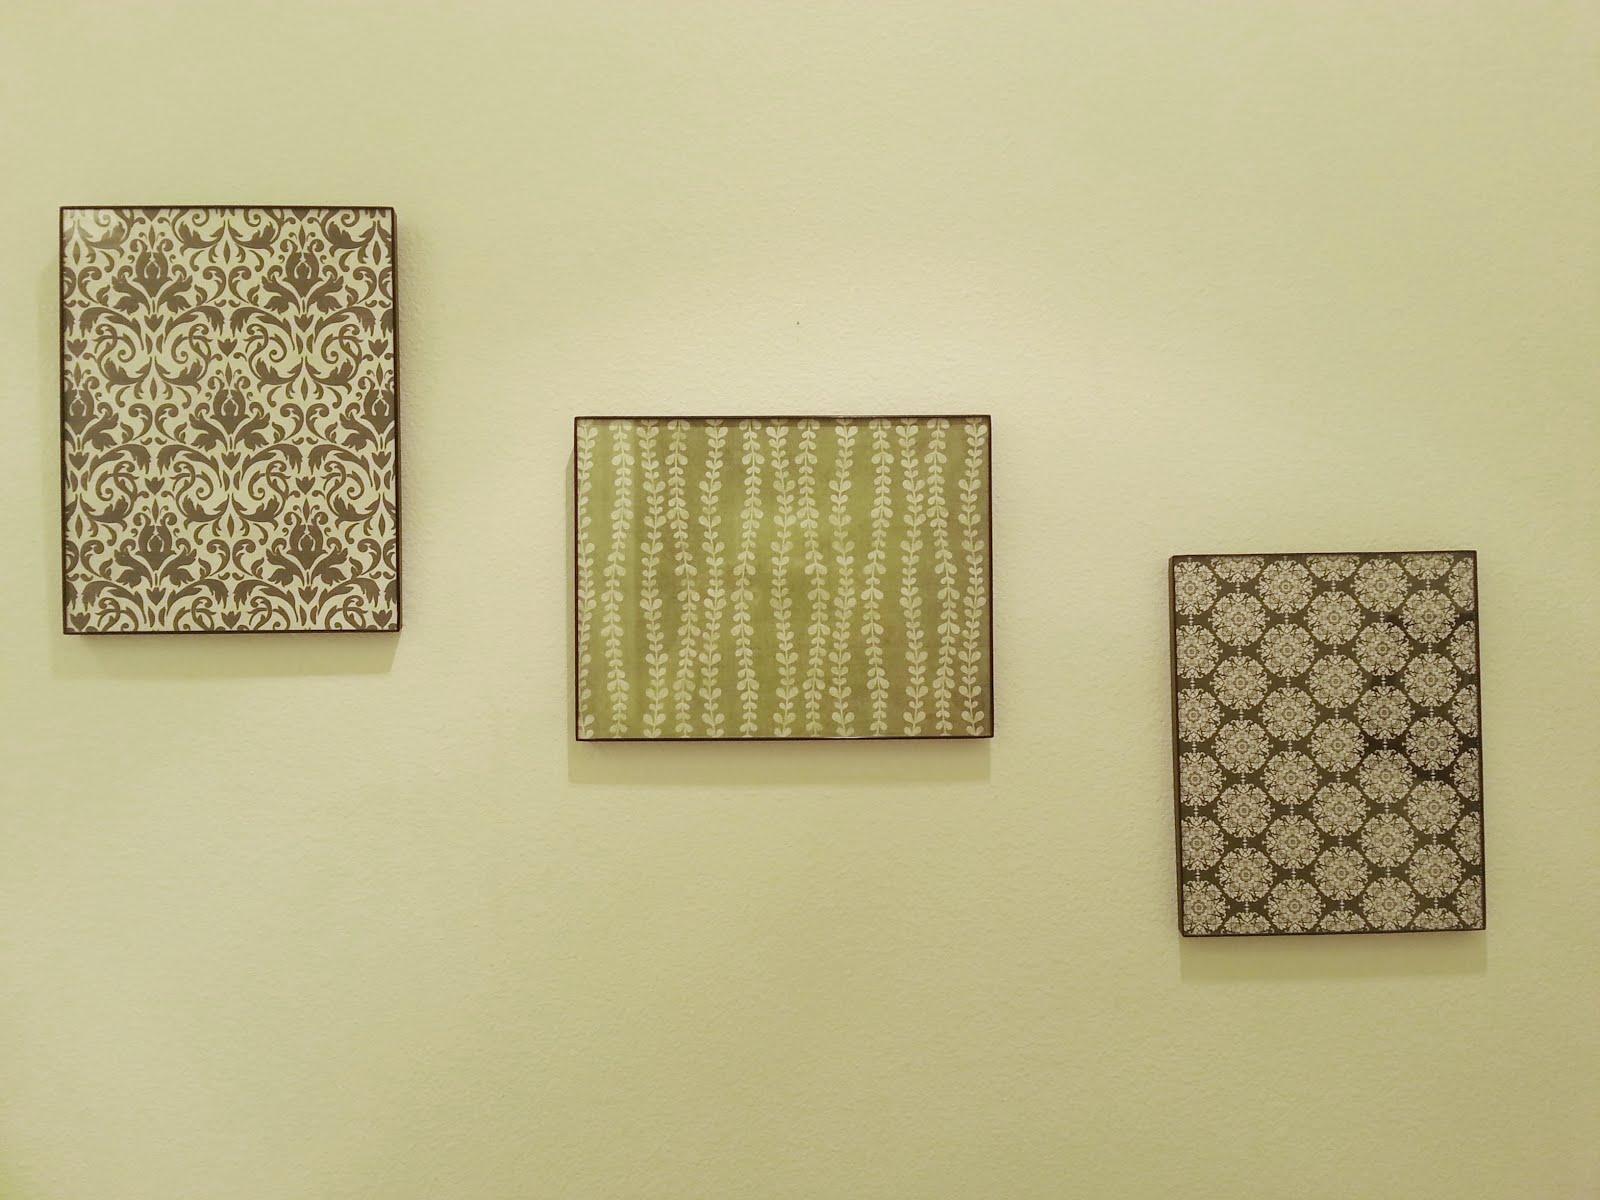 Wall Decor With Scrapbook Paper : Smock paper scissor scrapbook wall art